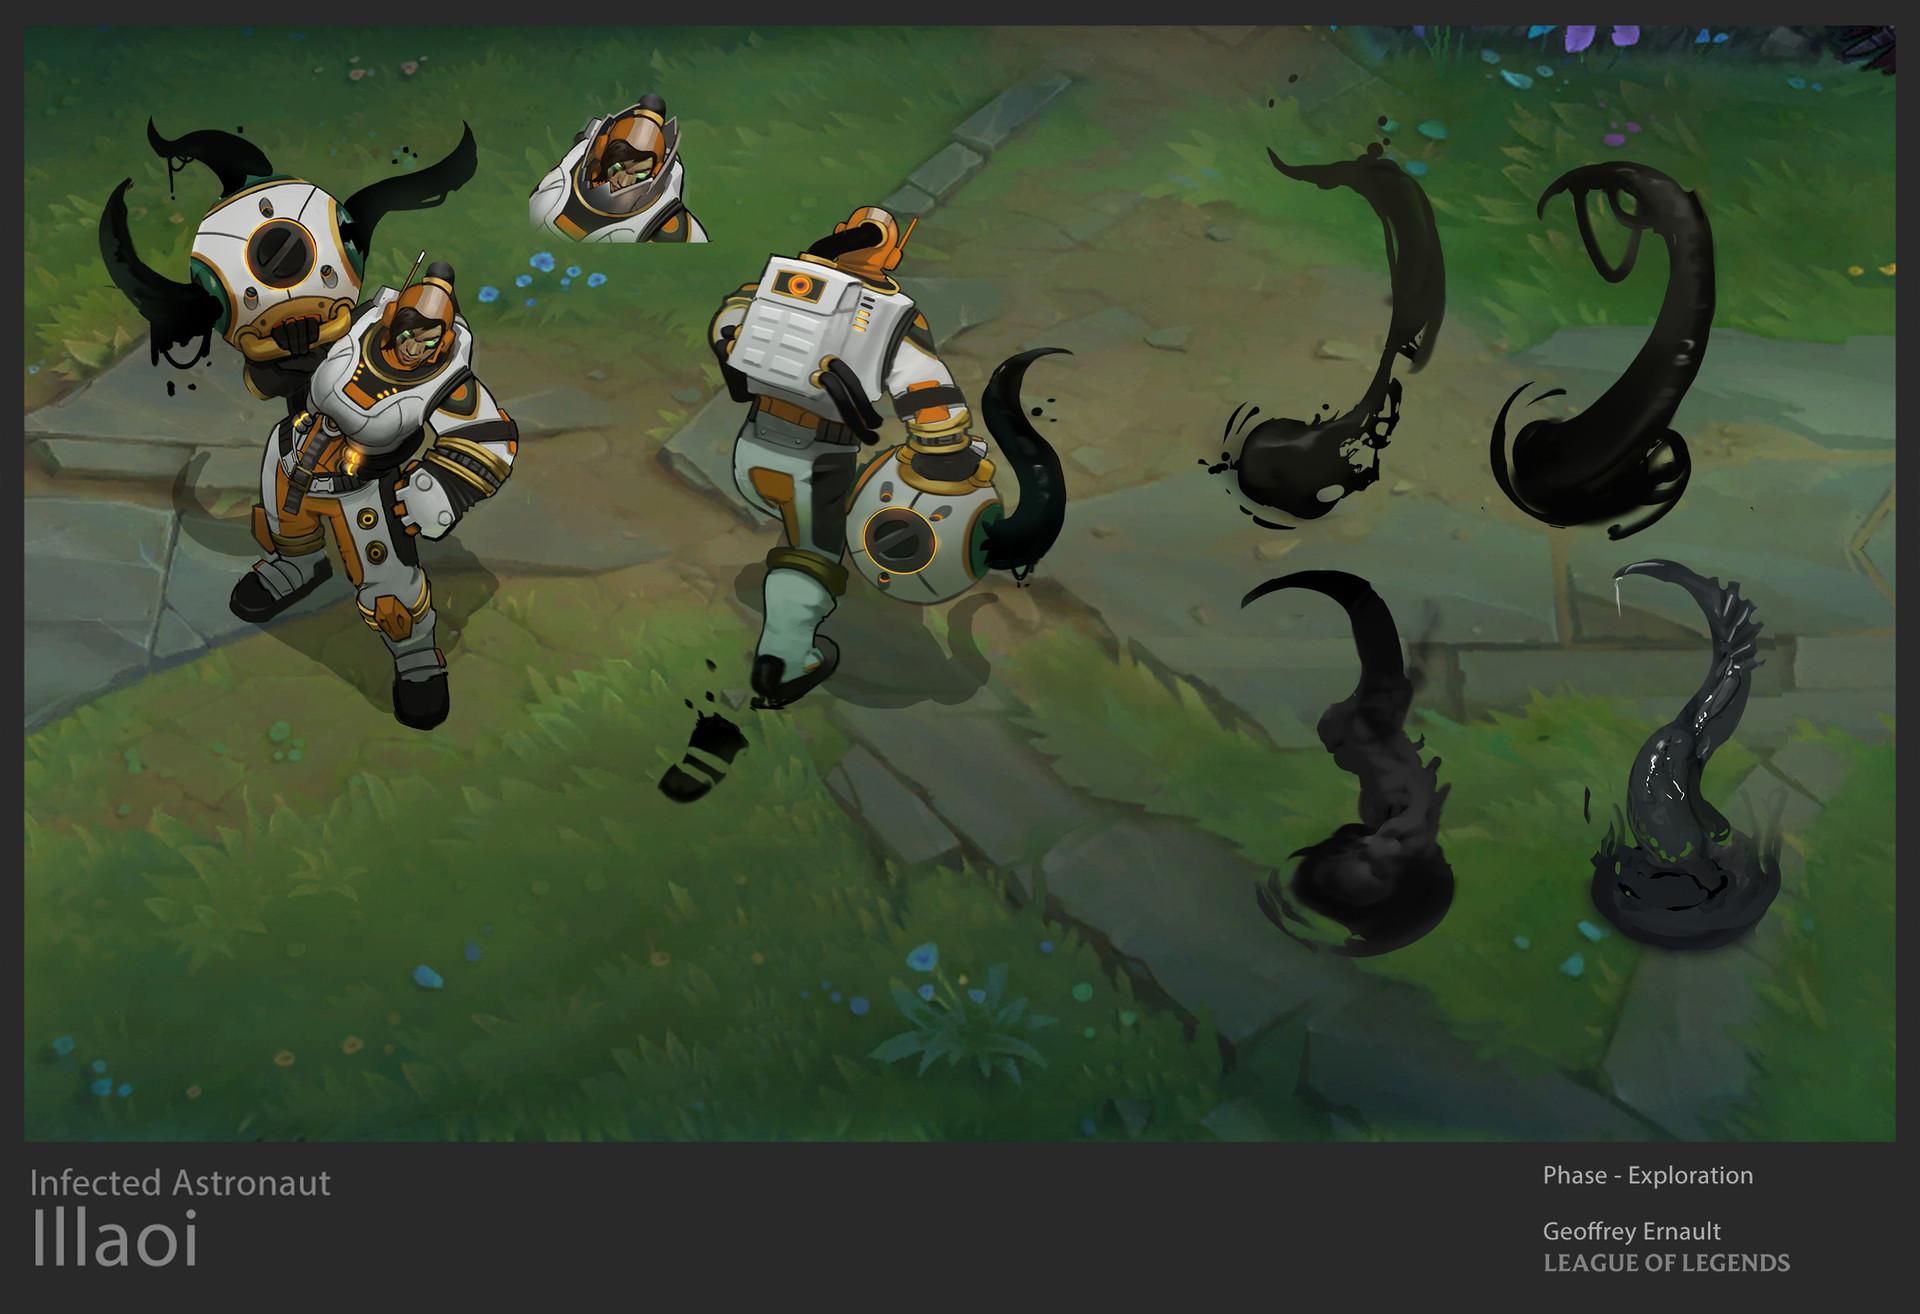 image illaoi infectedastronaut concept 01 jpg league of legends